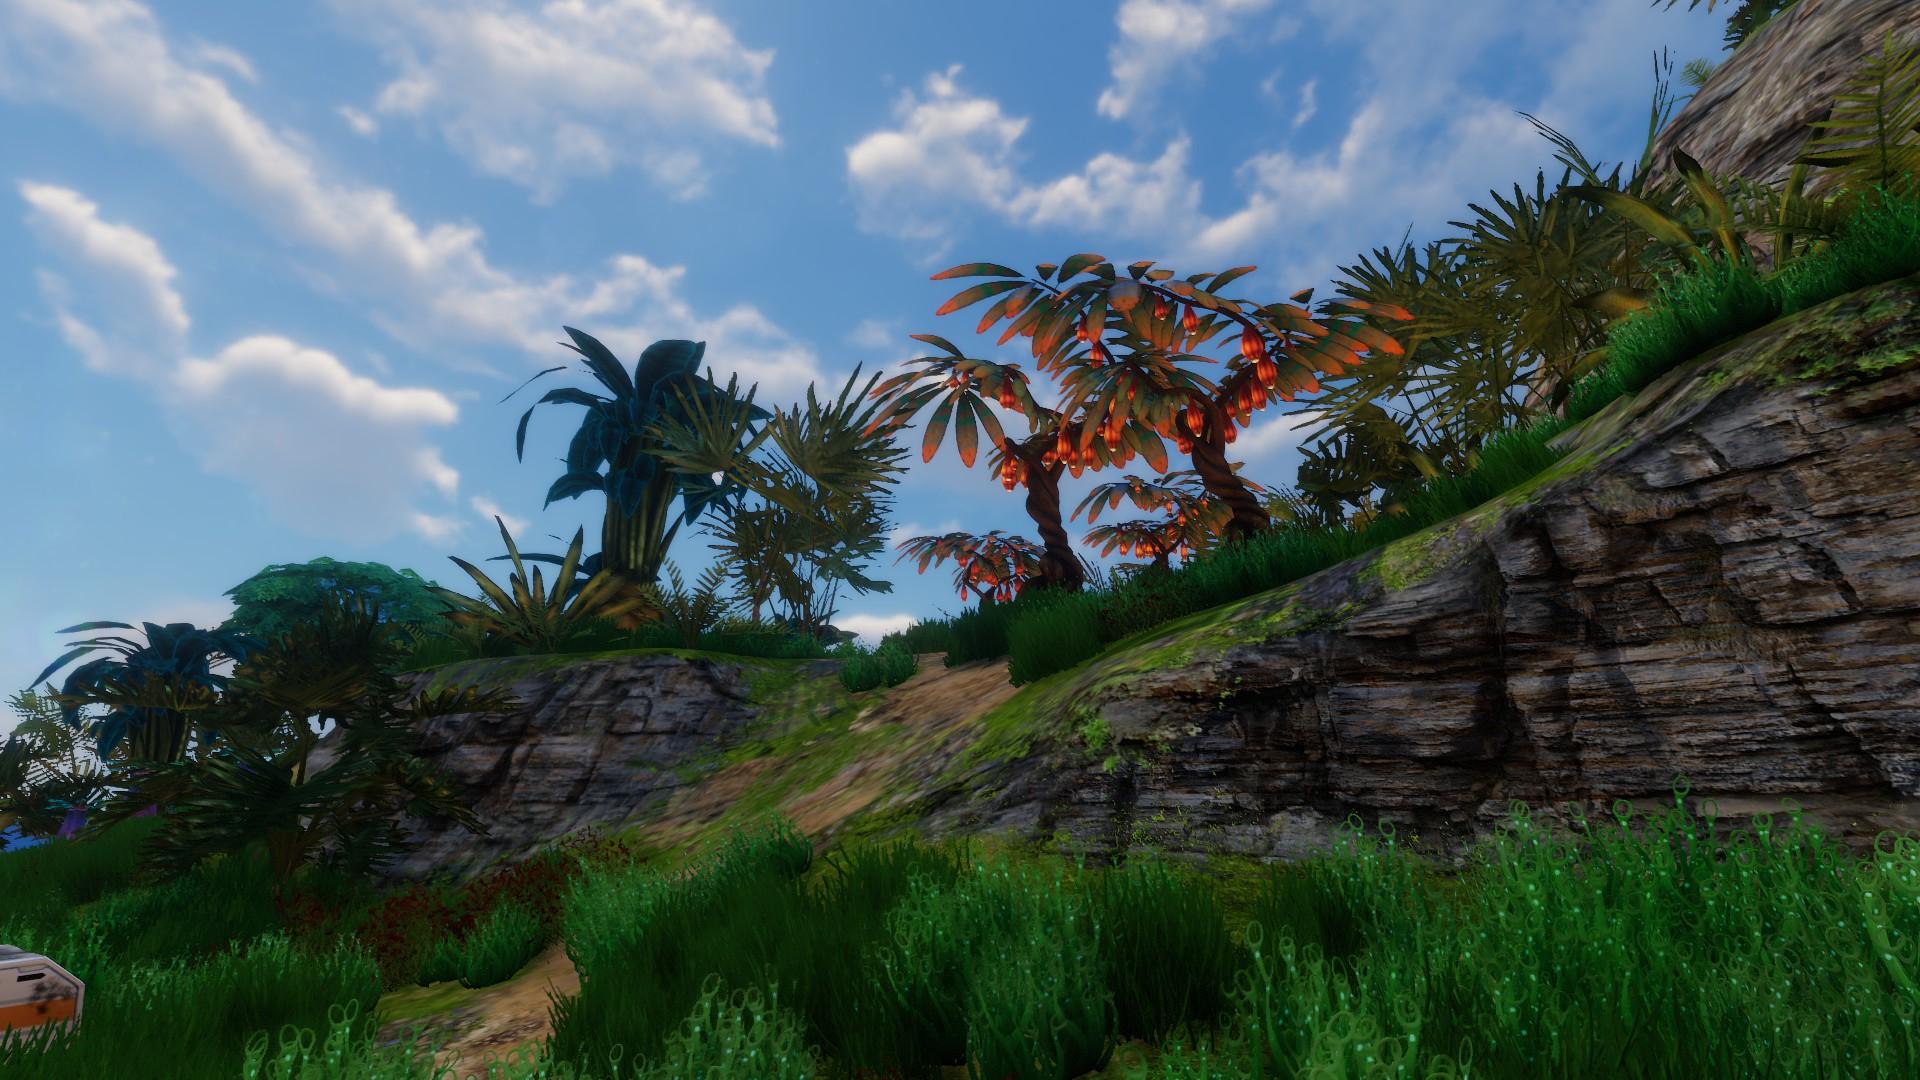 subnautica pc gaming video games screen shot